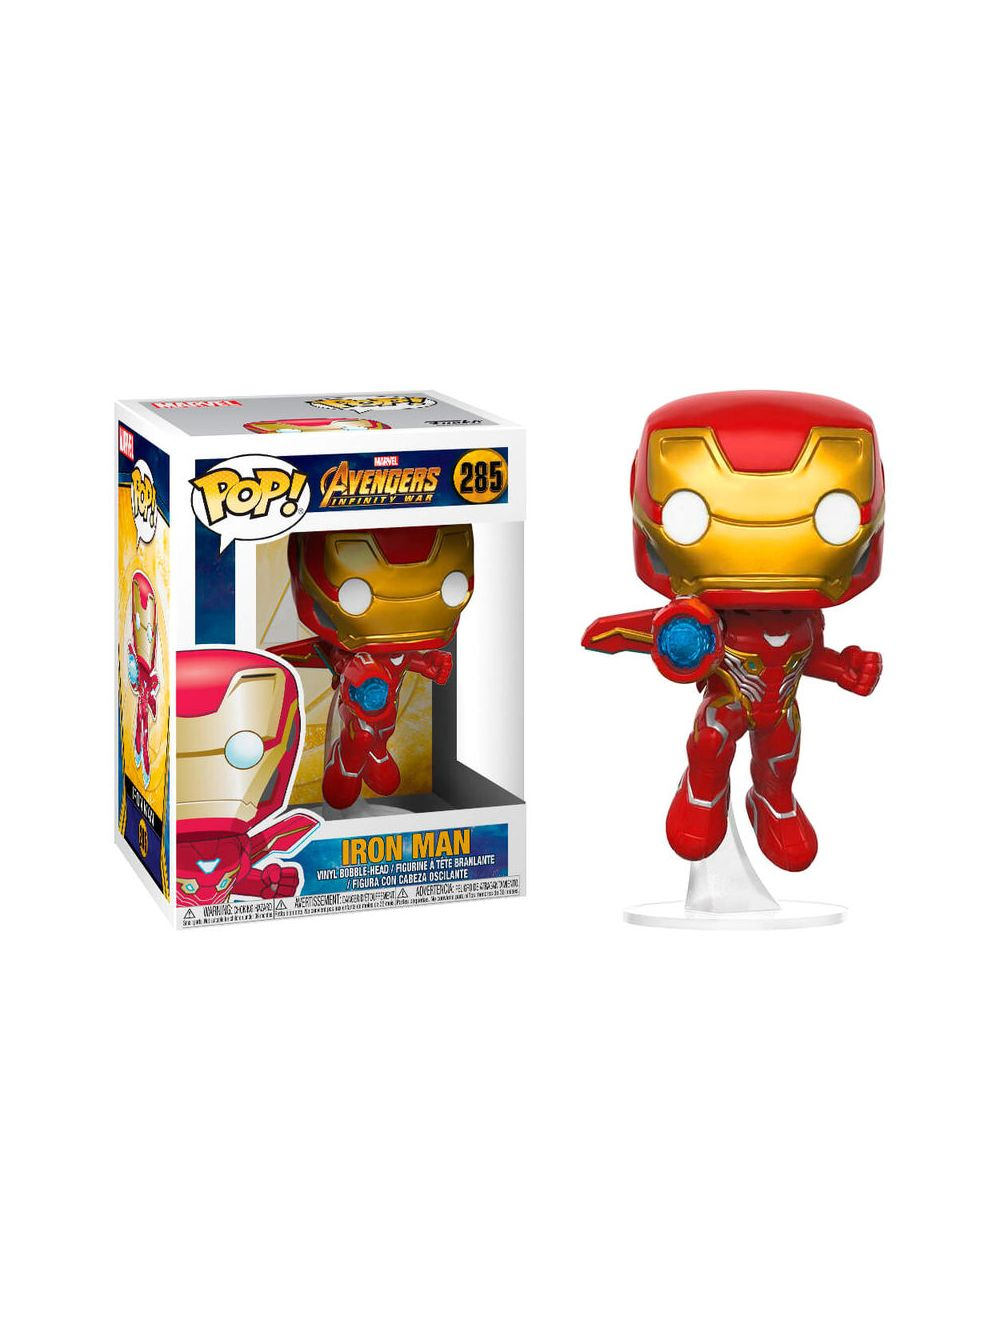 Funko POP! Marvel Avengers Infinity War Iron Man / Vasember with Wings Vinyl Figura 10cm